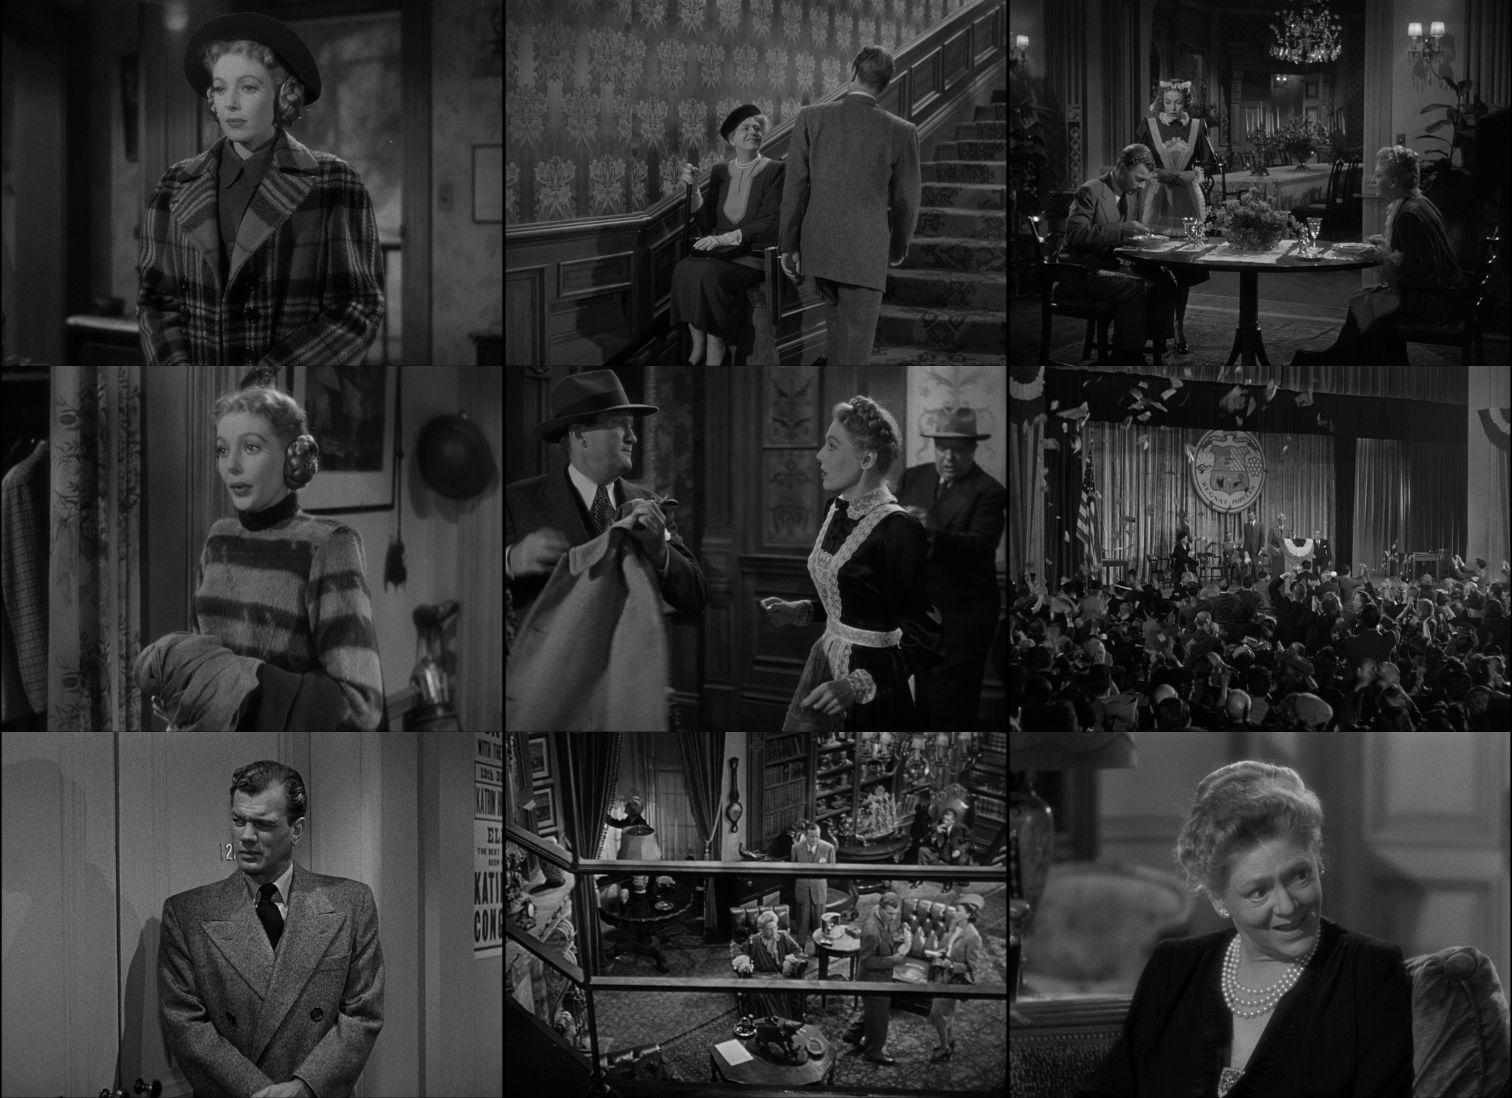 悠悠MP4_MP4电影下载_农家女 The.Farmers.Daughter.1947.1080p.BluRay.x264-PSYCHD 9.85GB